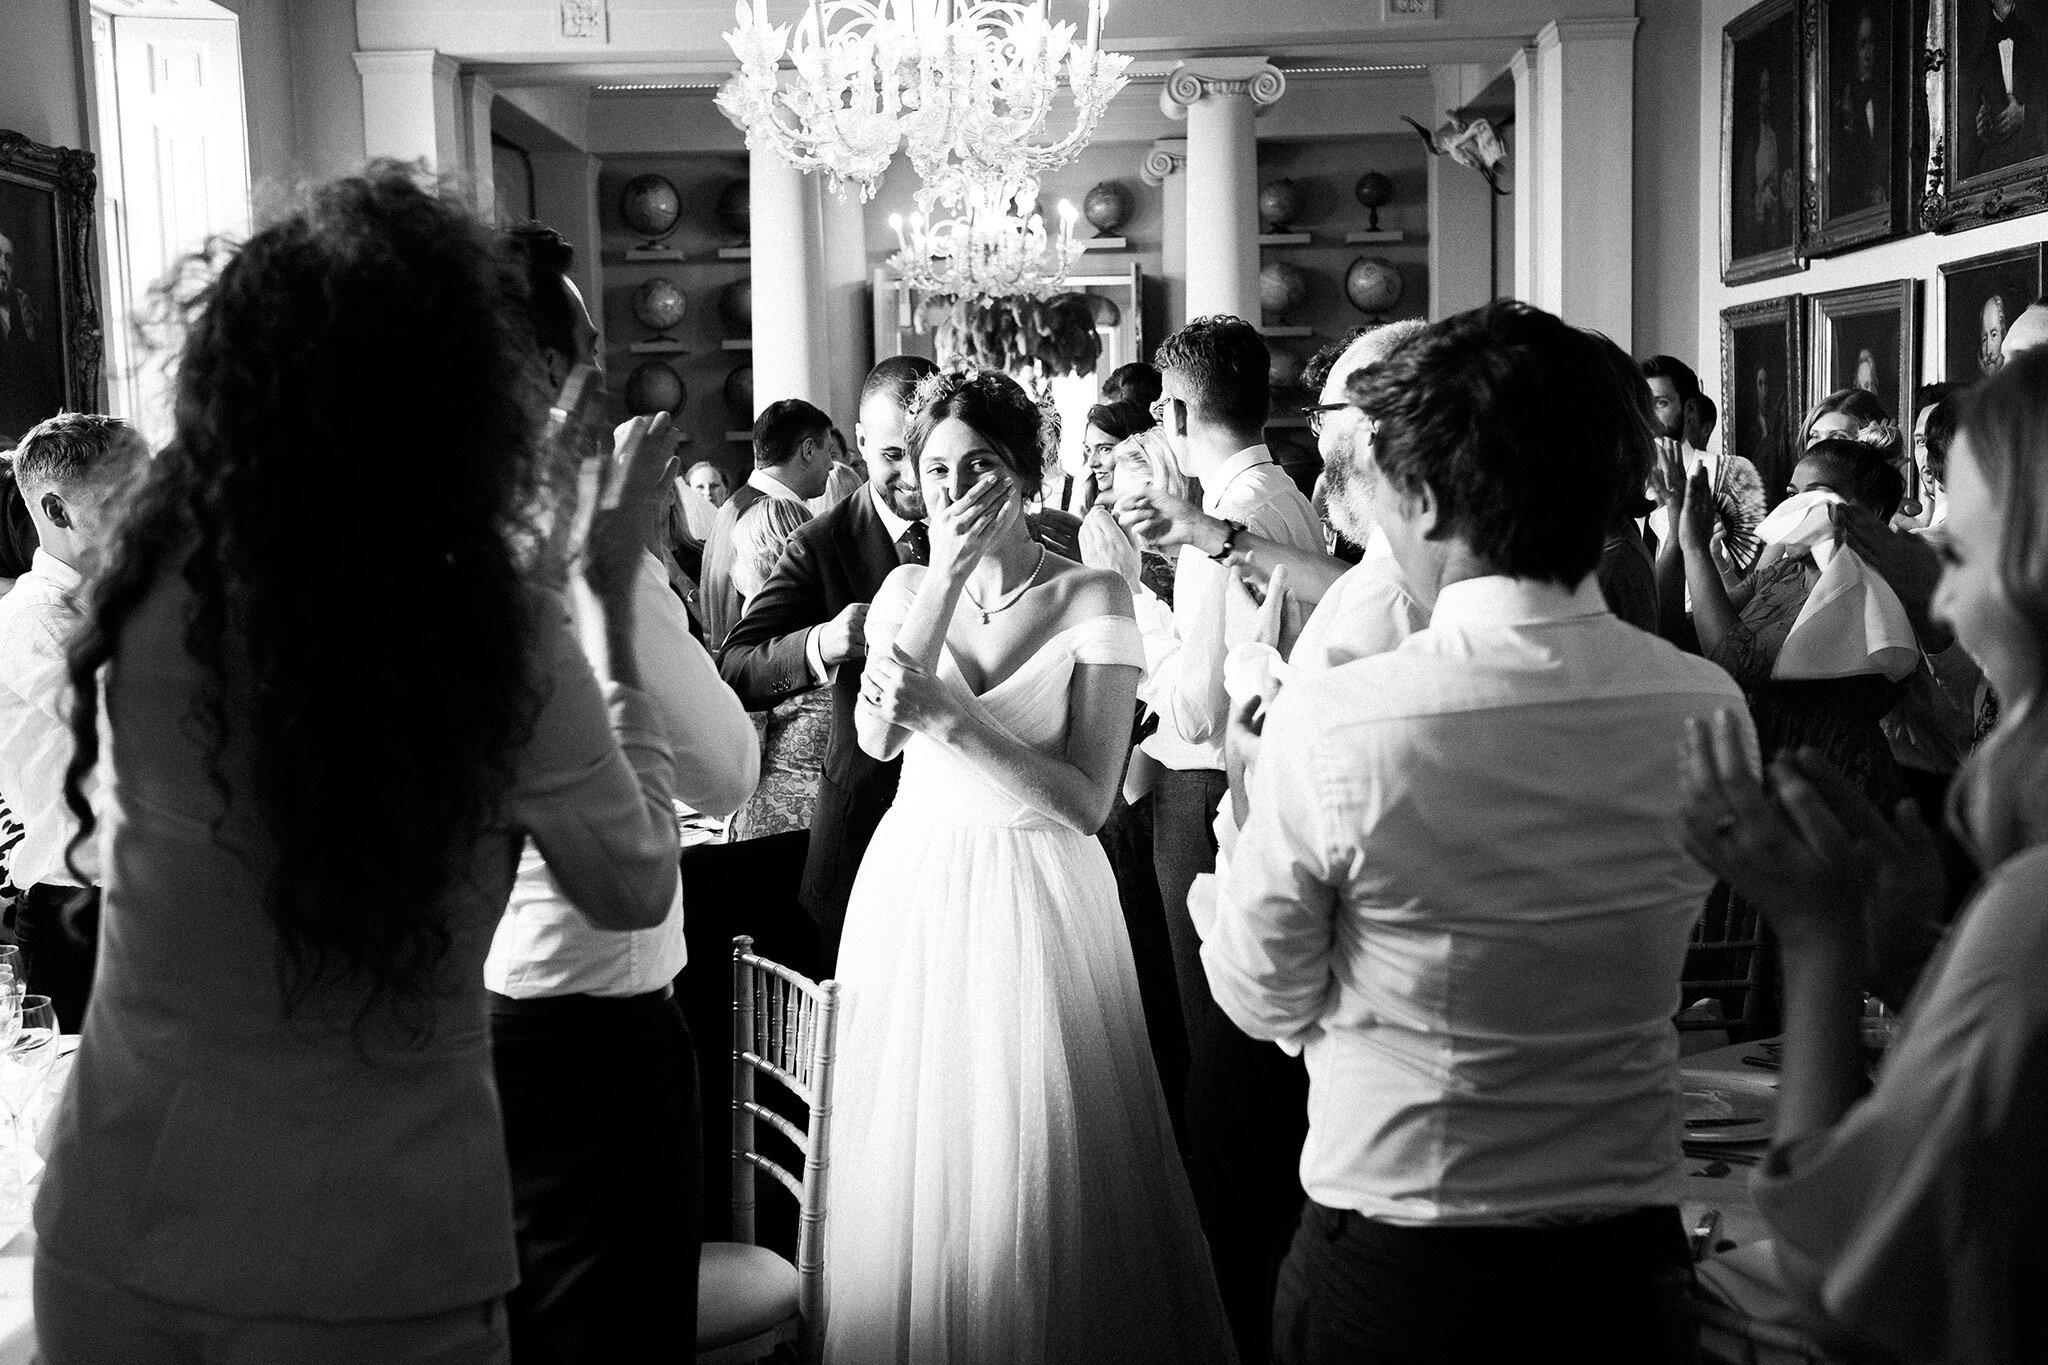 Scott-Stockwell-Photography-wedding-photographer-aynhoe-park-enterance.jpg